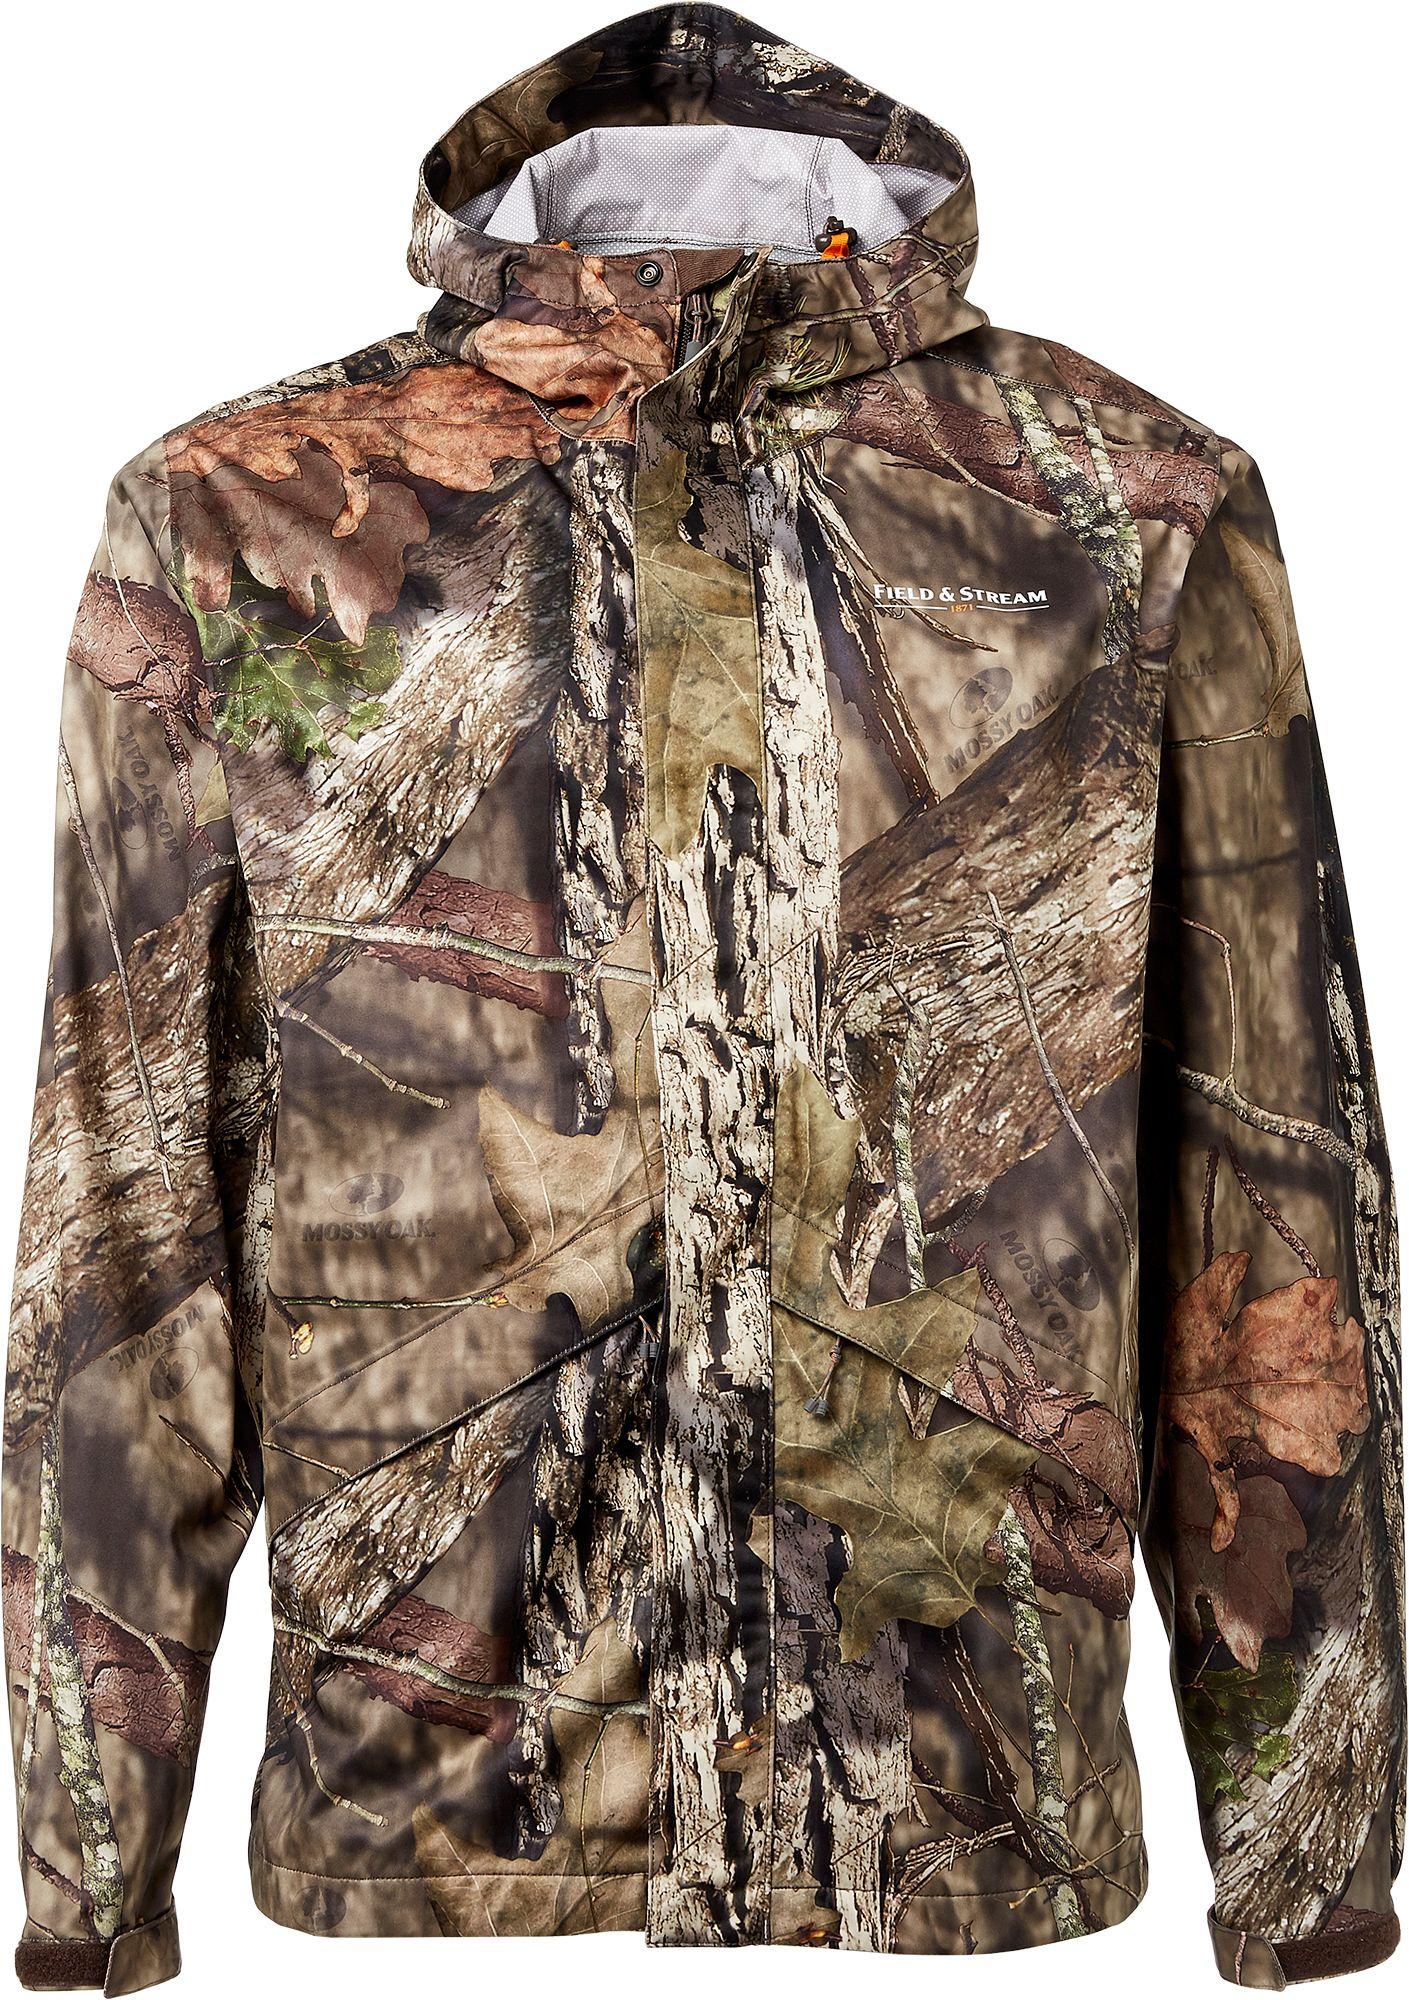 Field & Stream Men's Every Hunt Packable Rain Jacket, Medium, Green